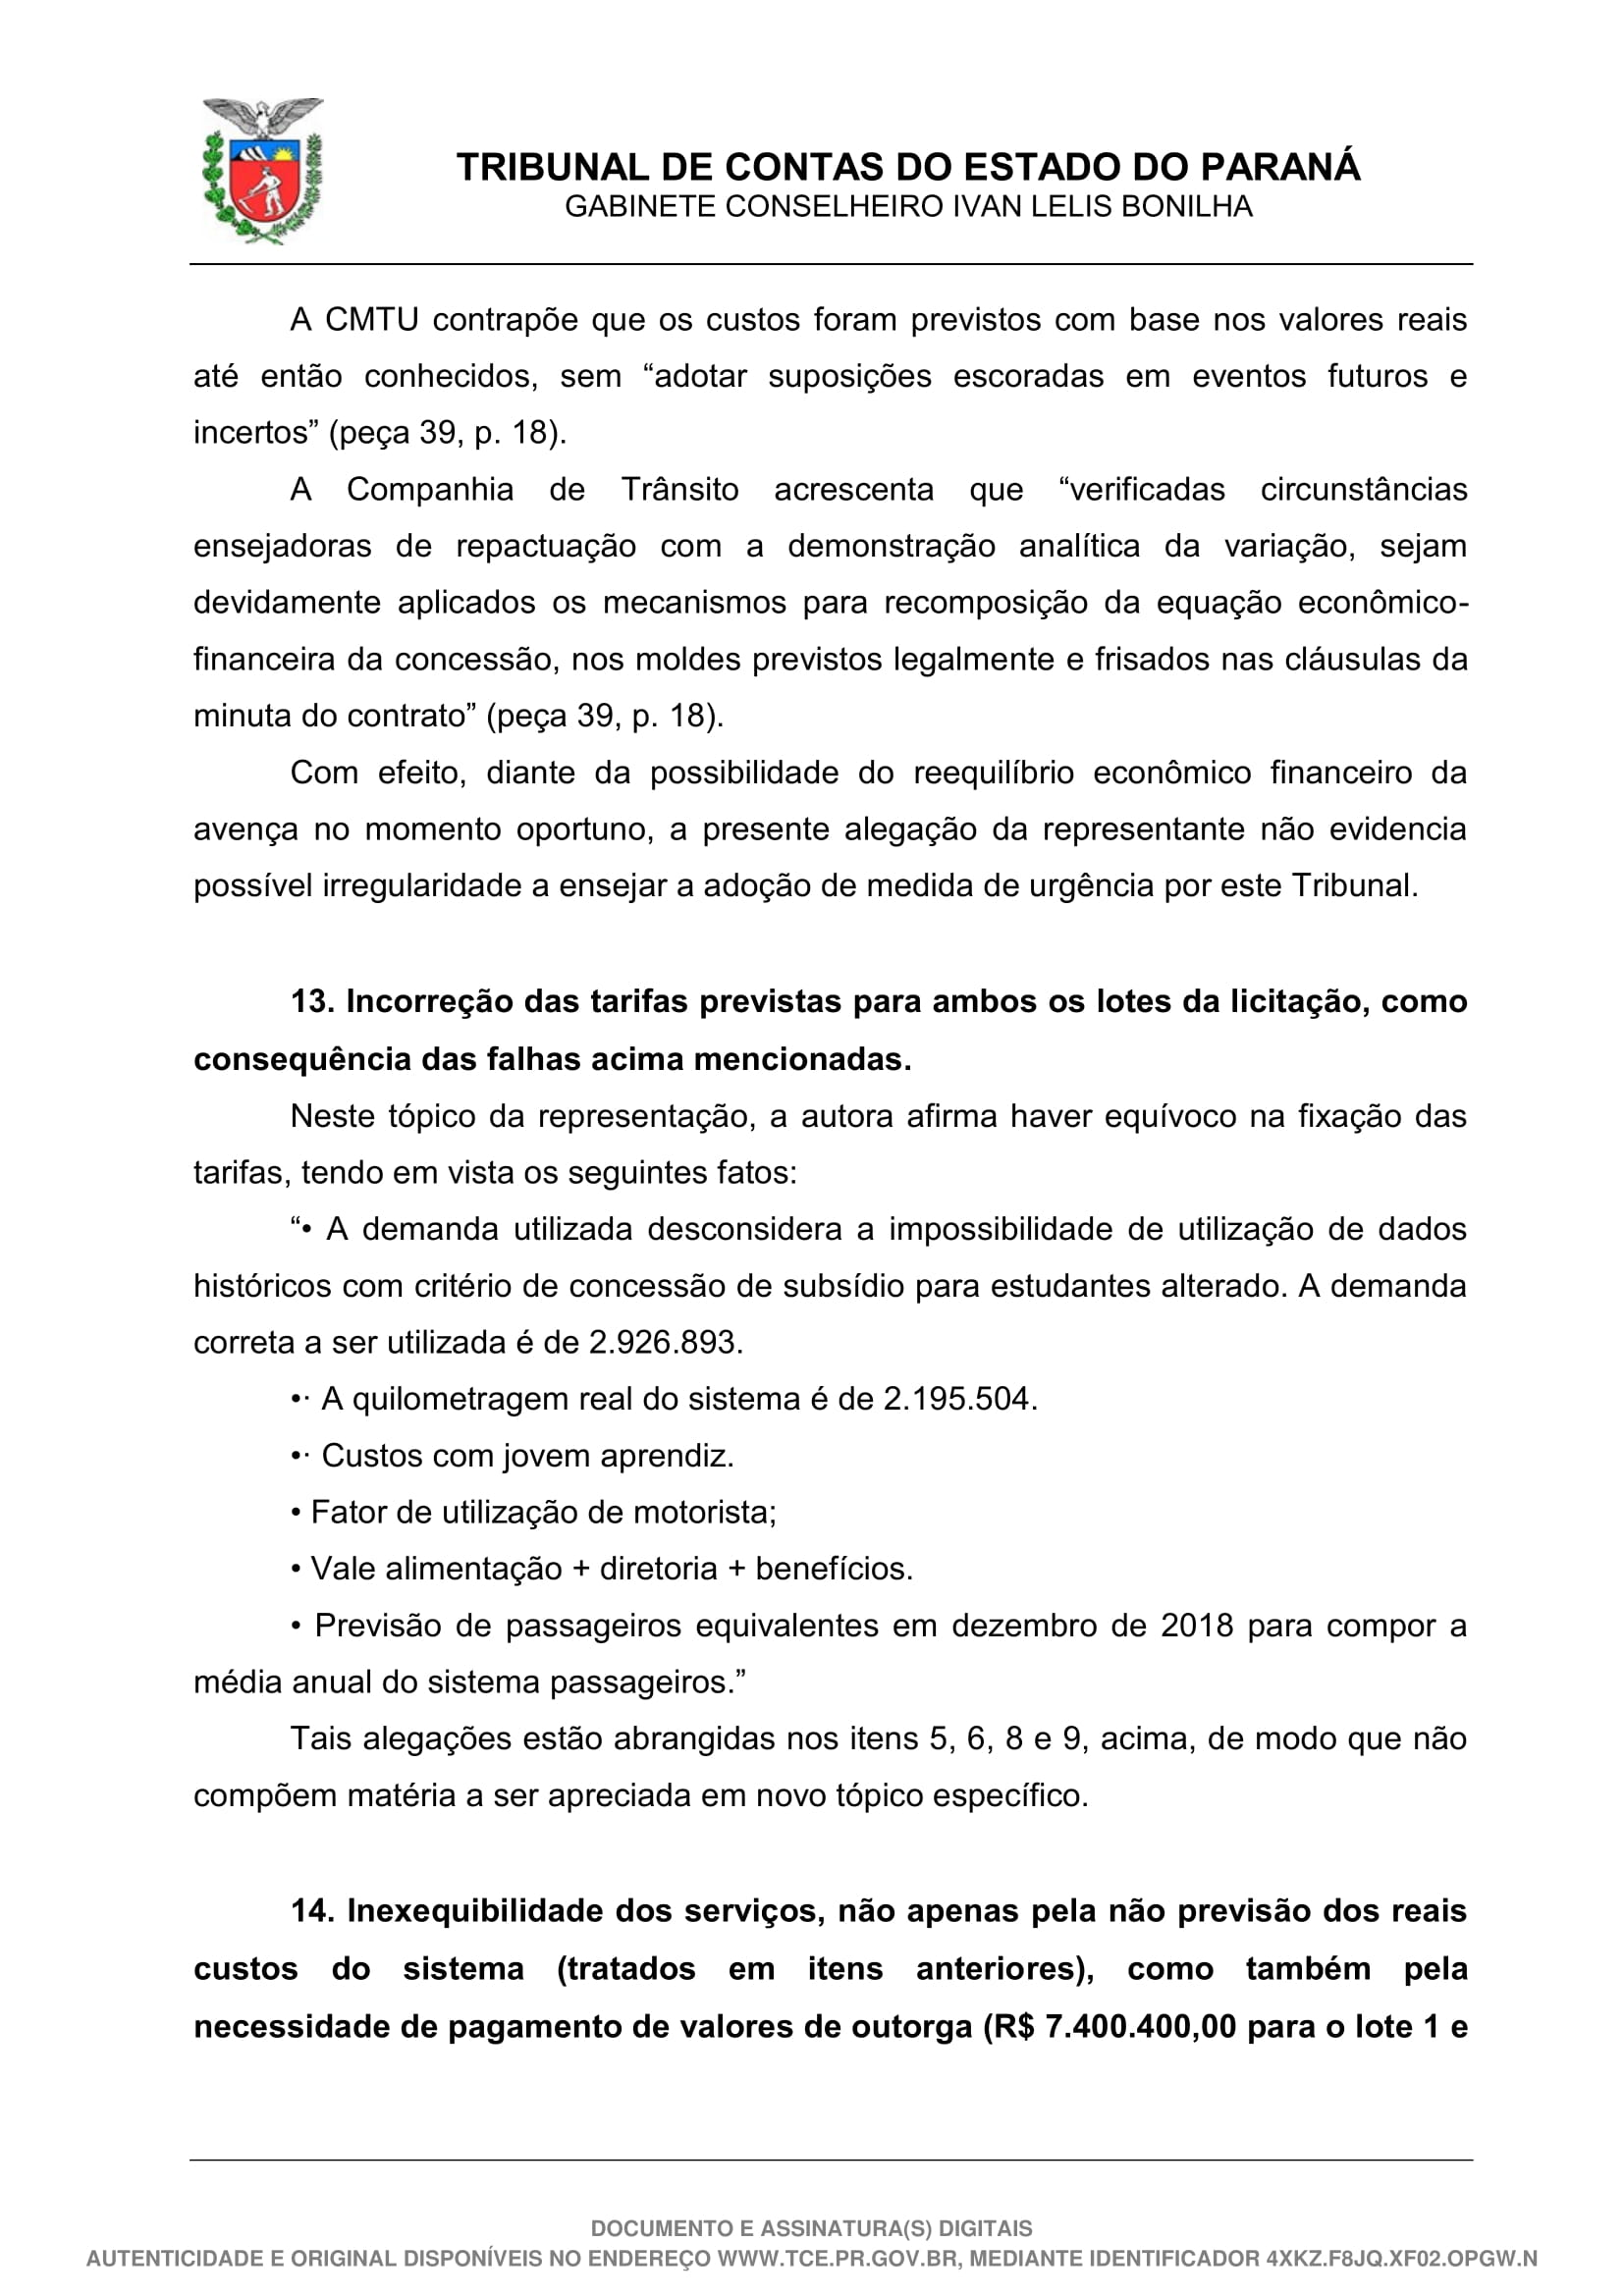 Despacho - 49-19 - GCILB-14